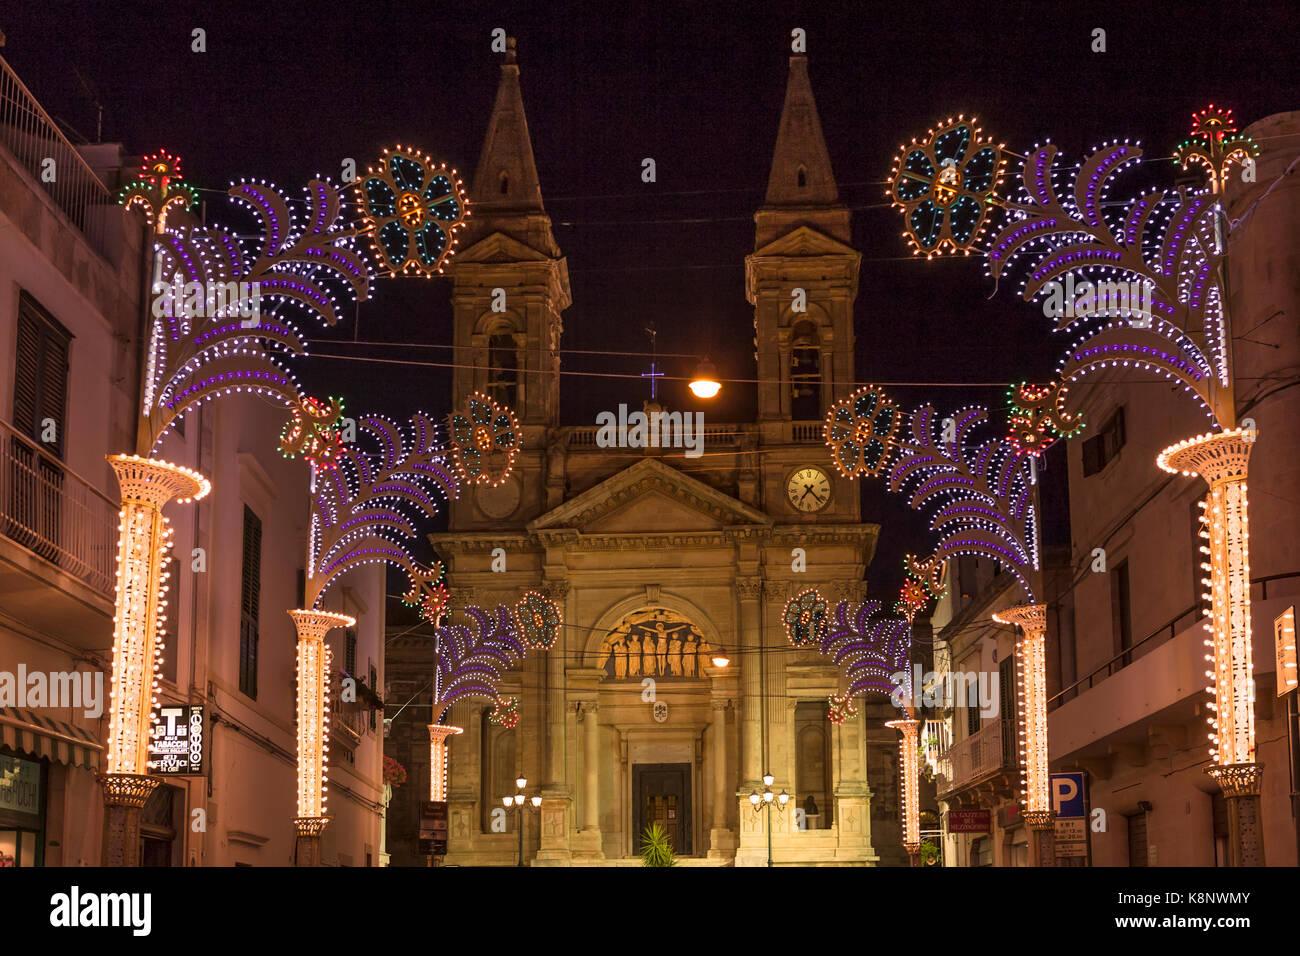 The duomo (cathedral) on Piazza Curri in late evening, Alberobello, Puglia, Italy - Stock Image